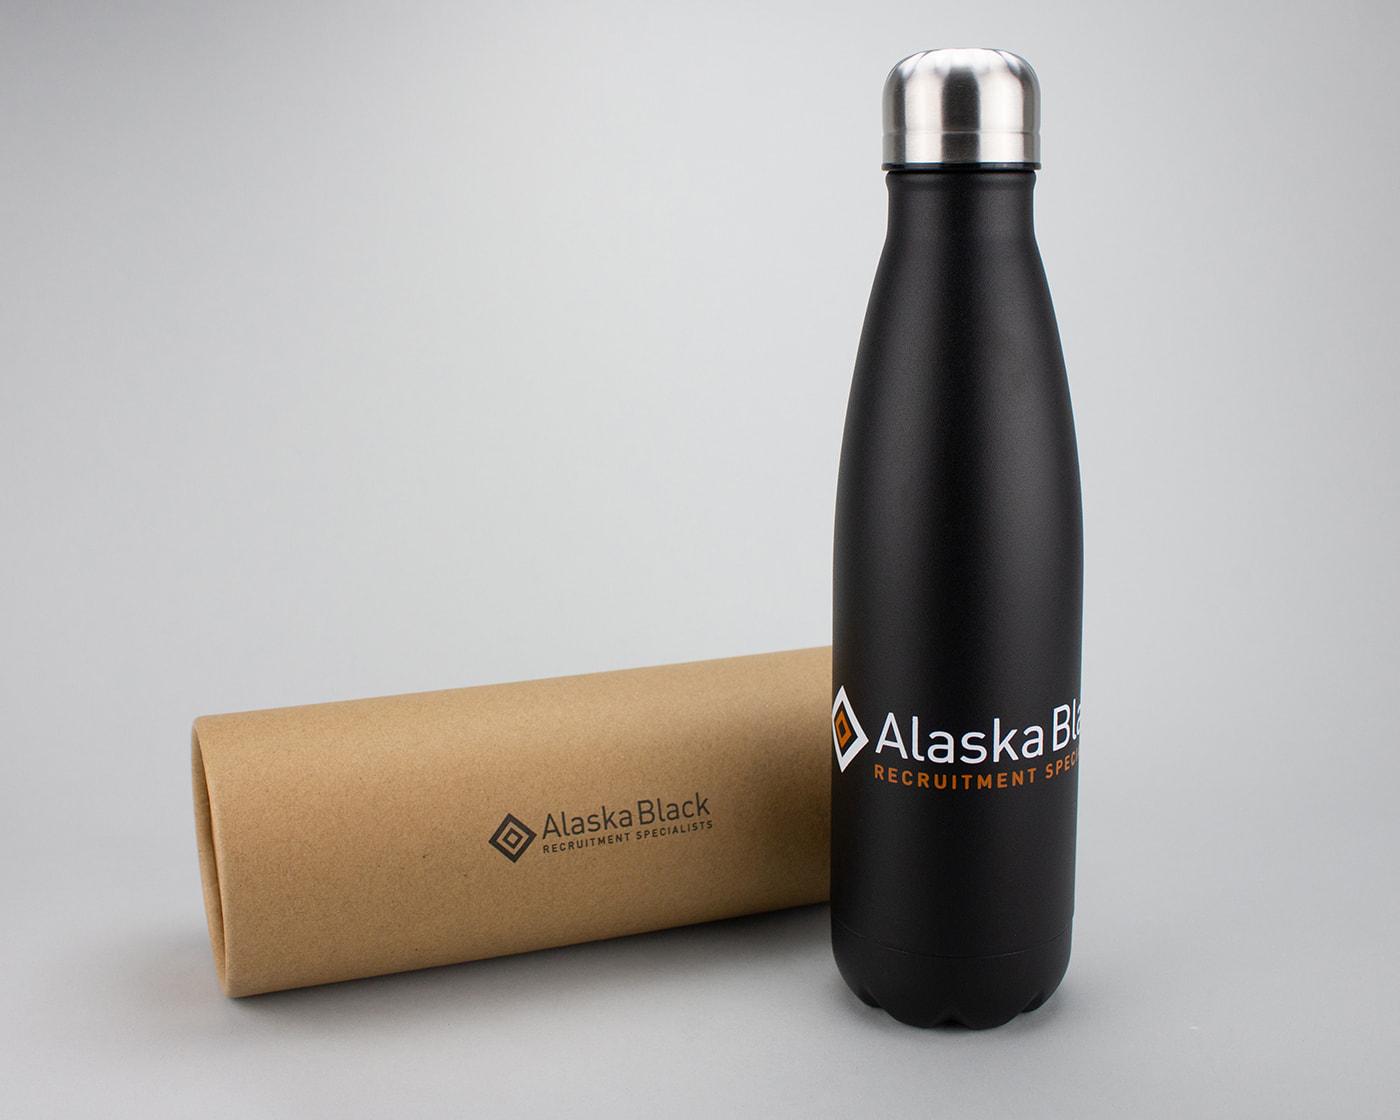 Alaska Black branded metal bottles